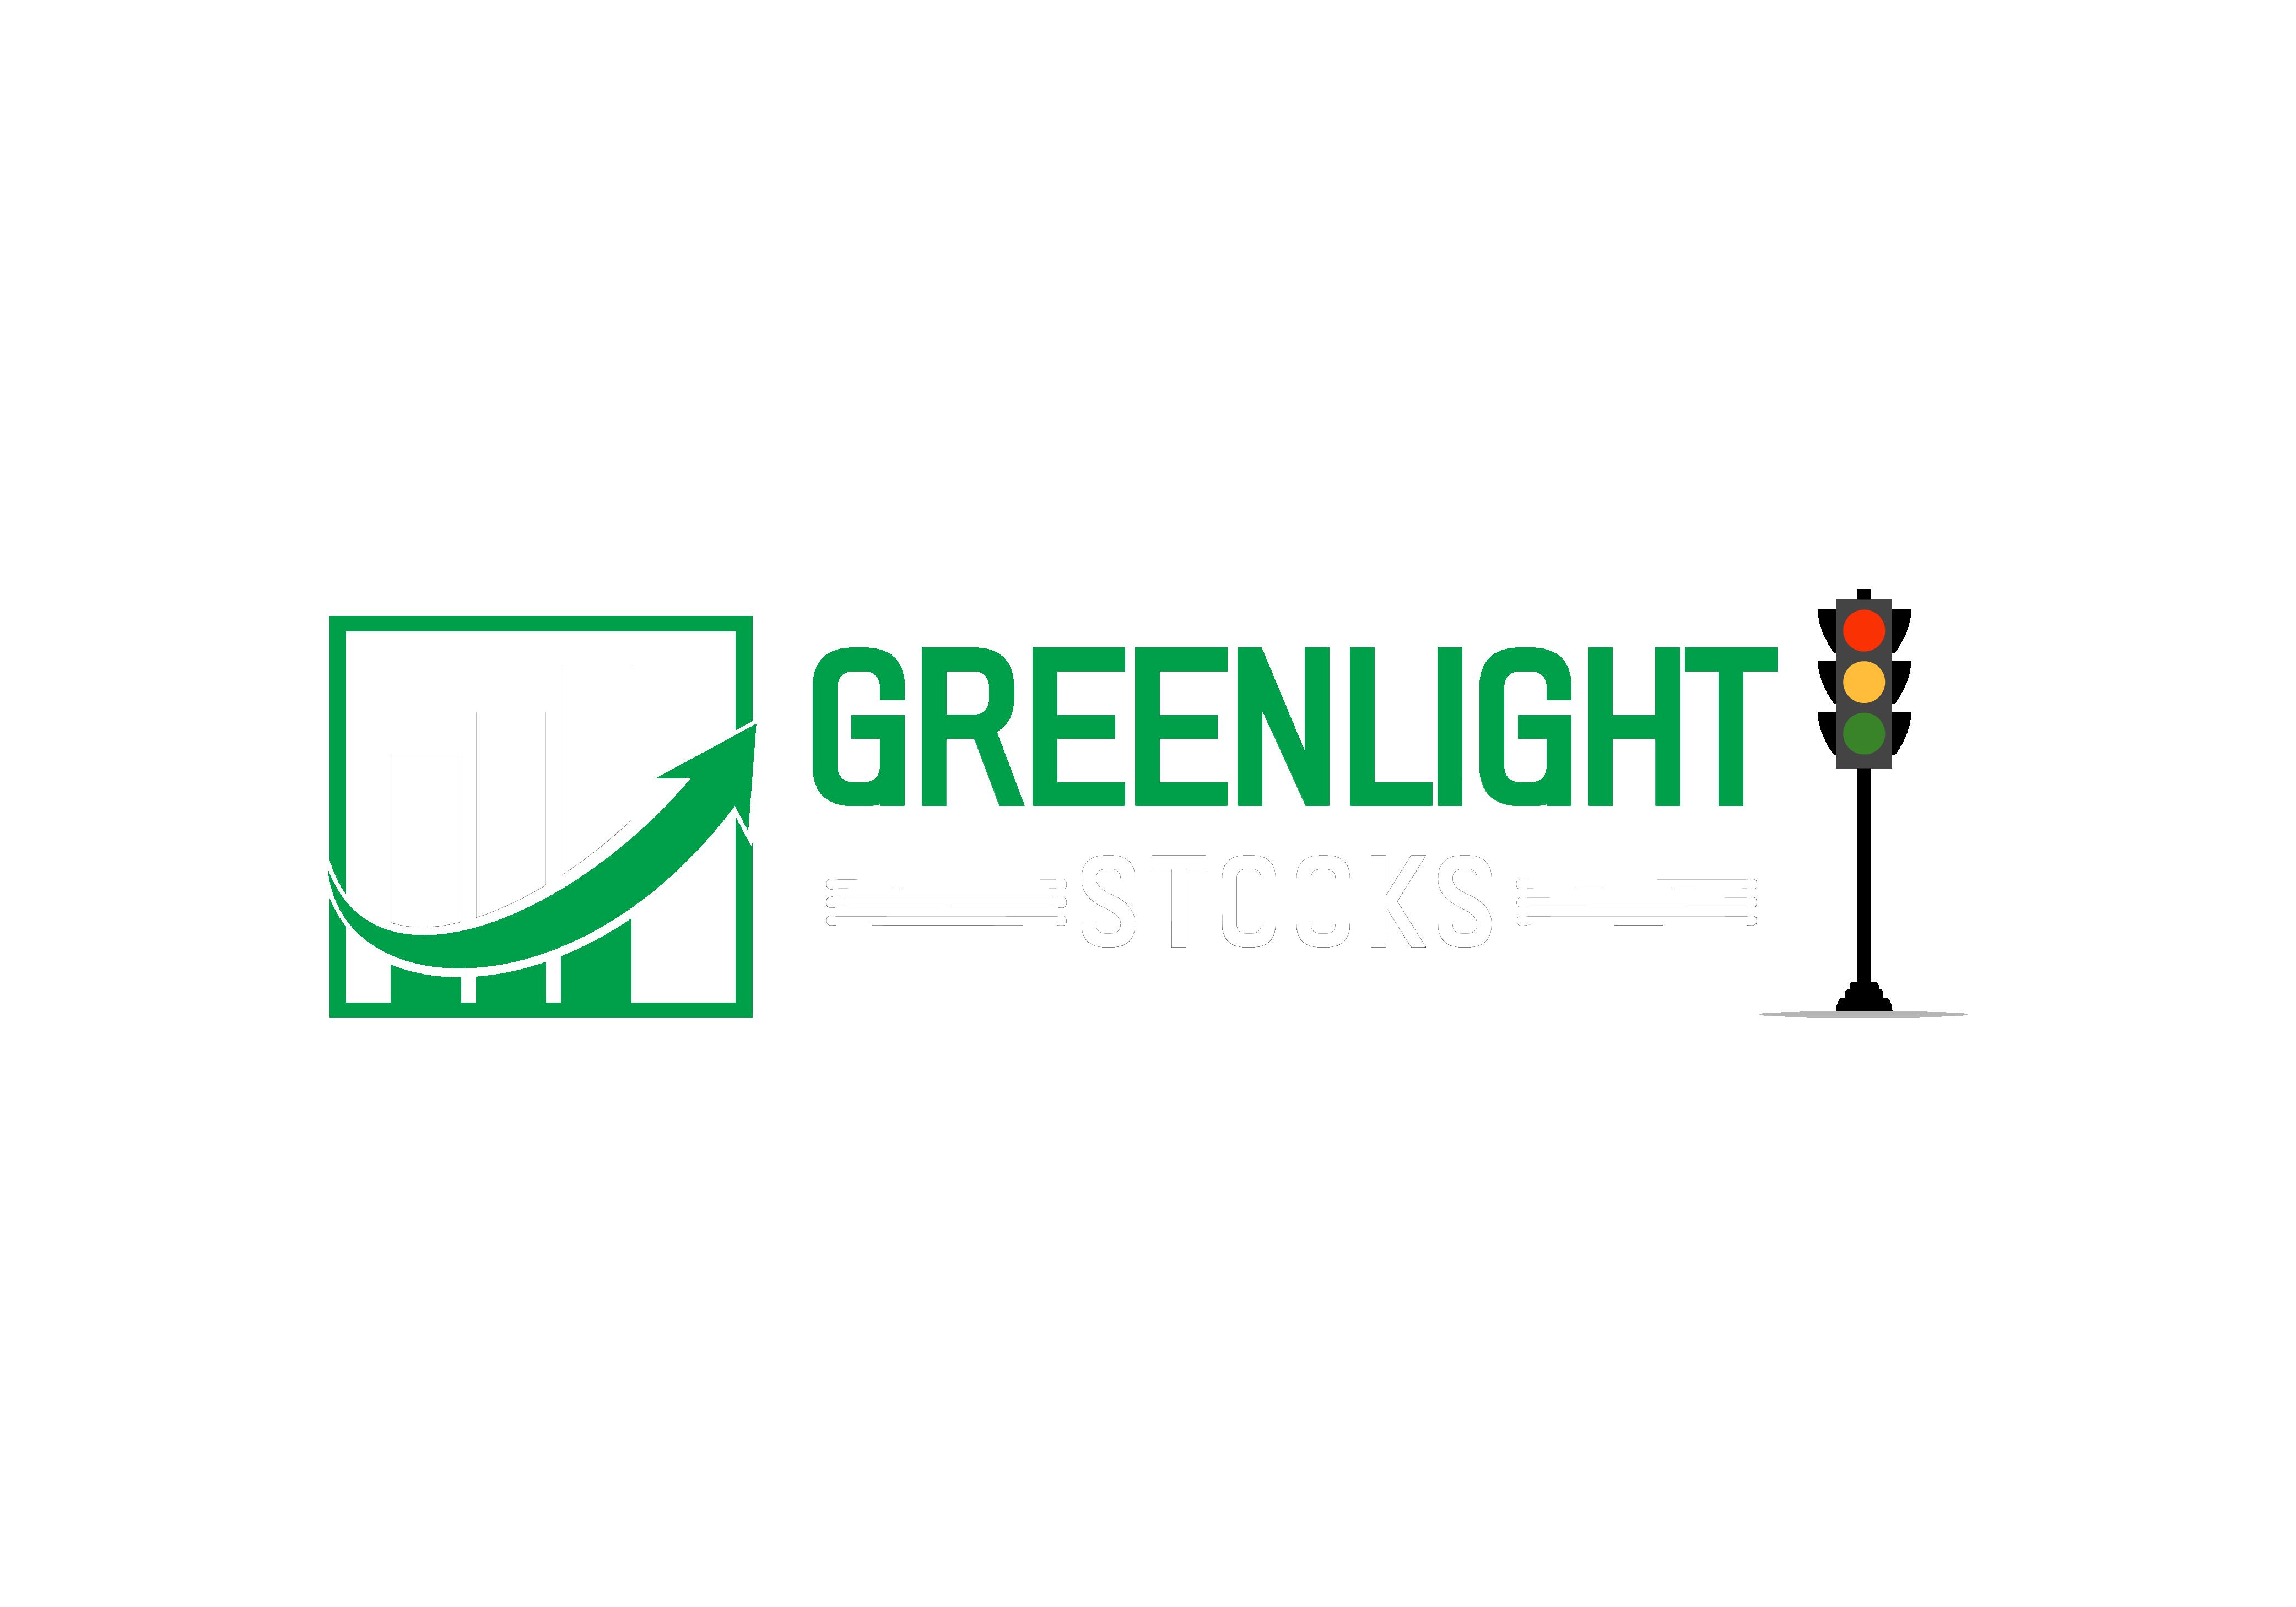 Green light Stocks